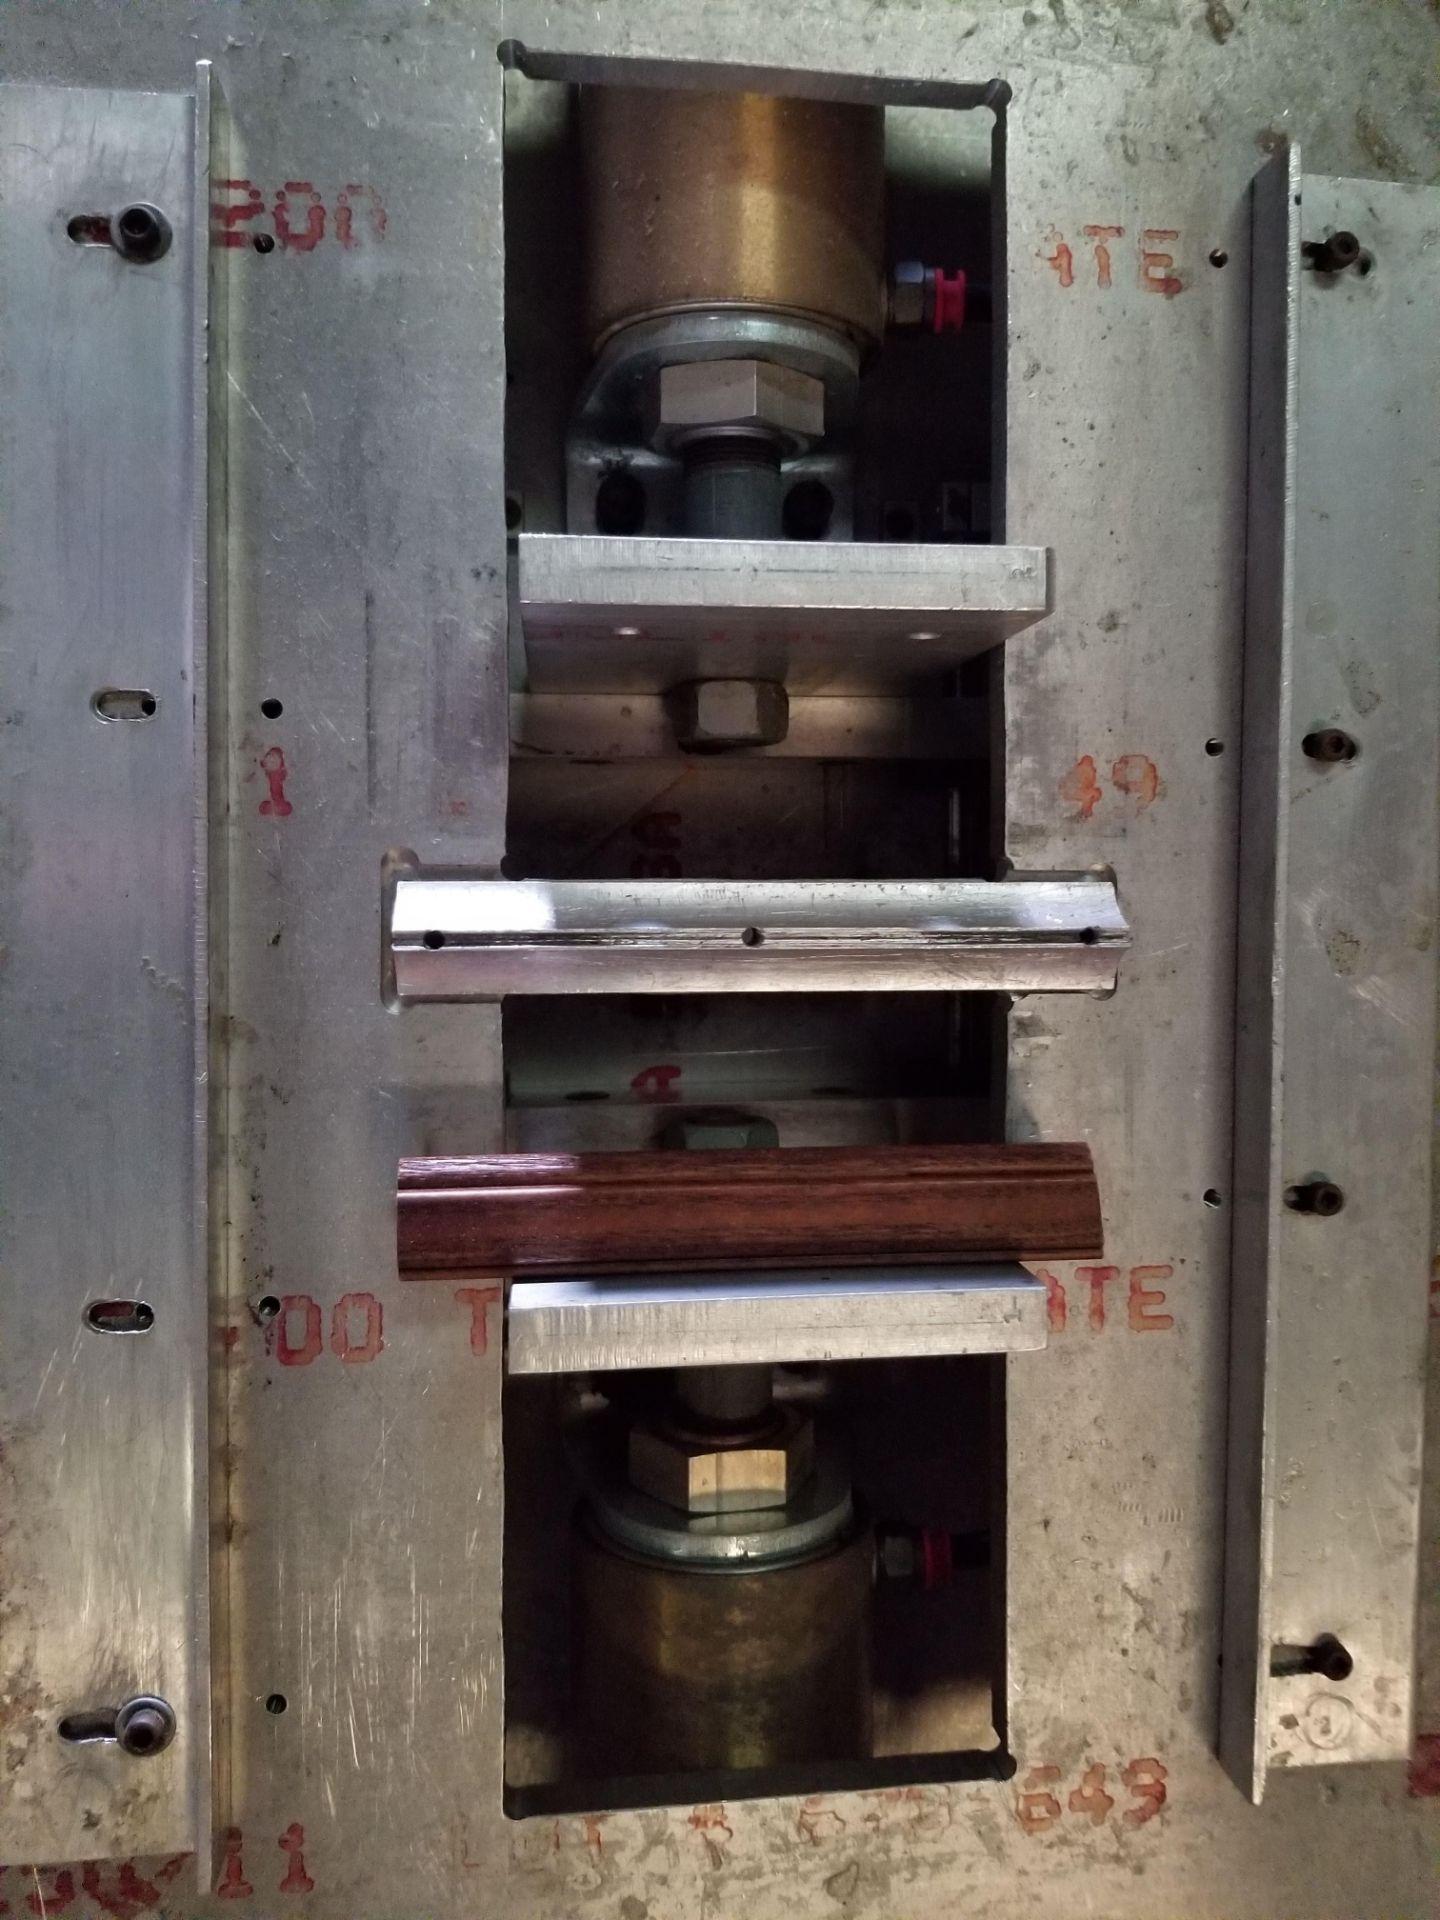 Lot 28 - Pnuematic Press w/ Aluminum Table